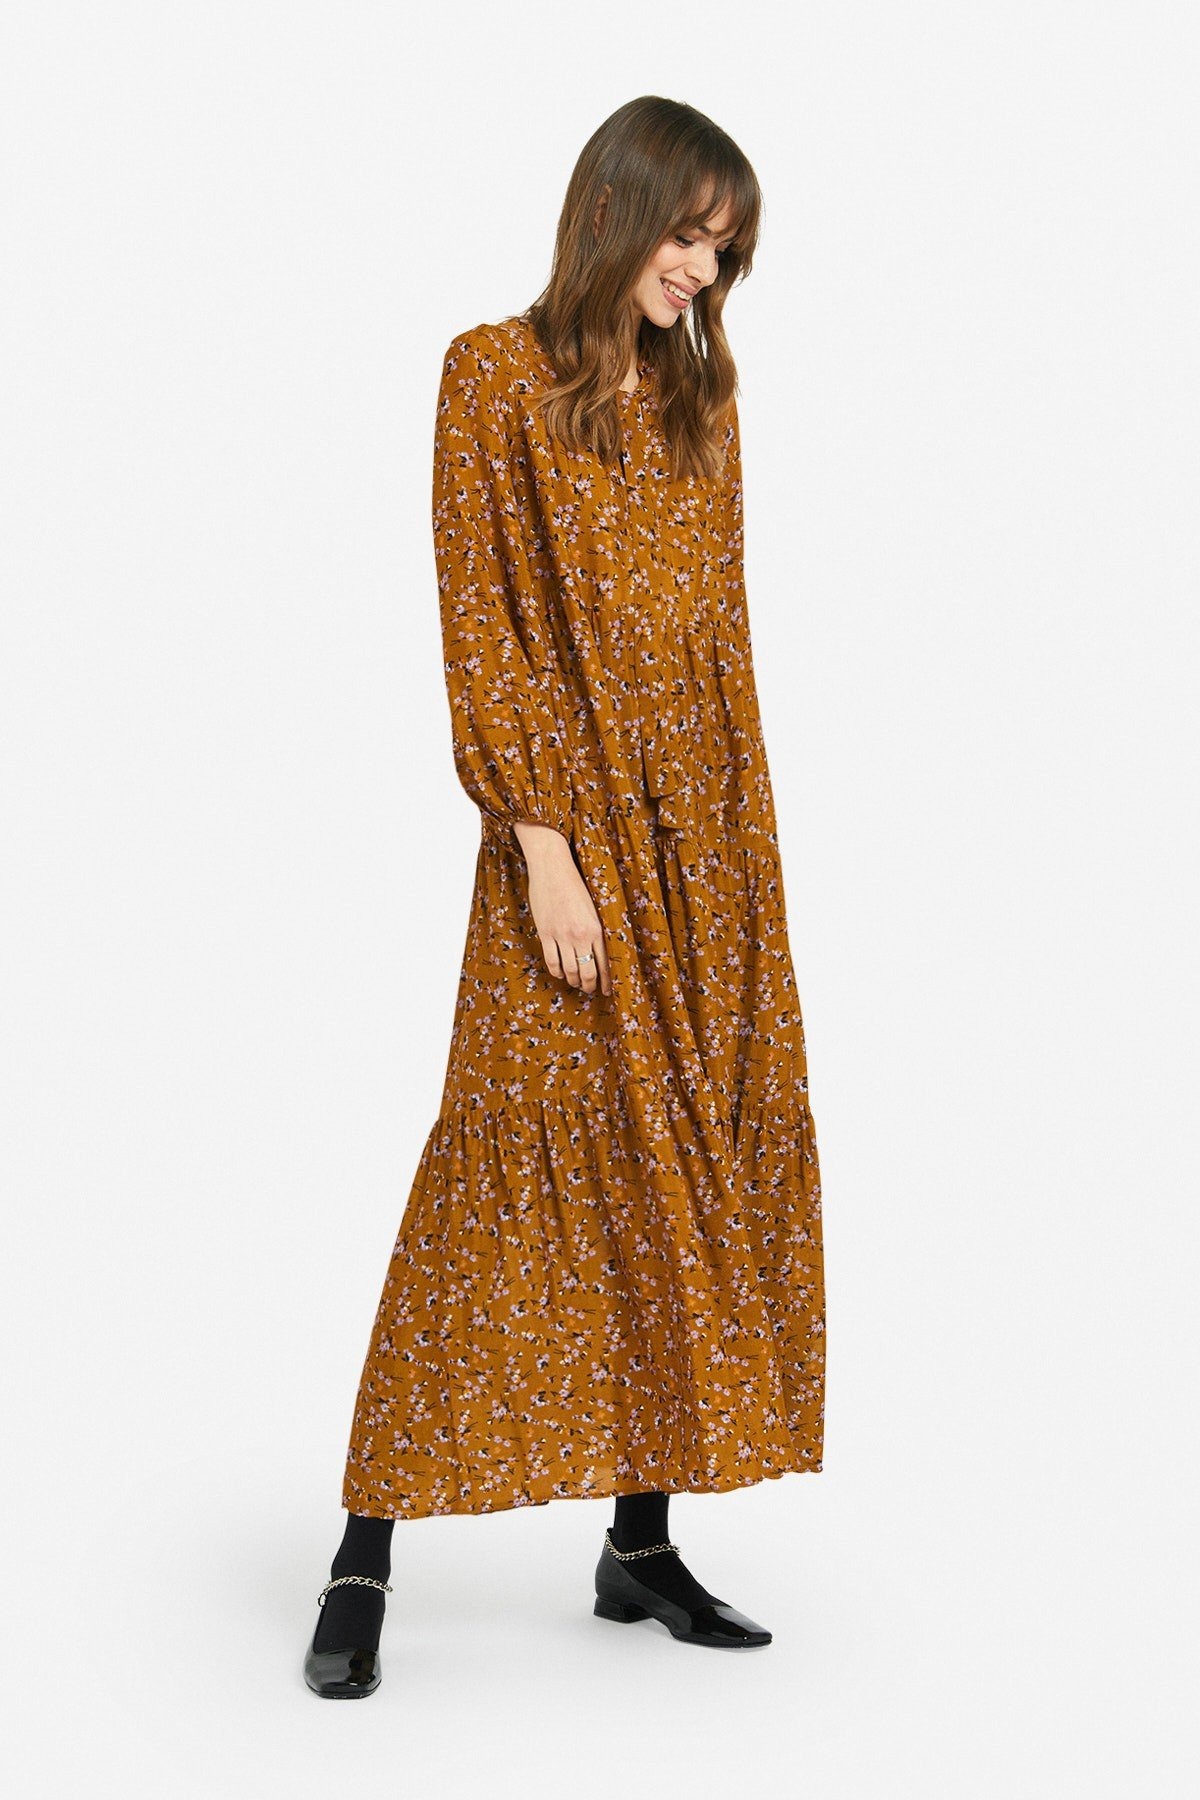 Viscose long dress with foulard neckline